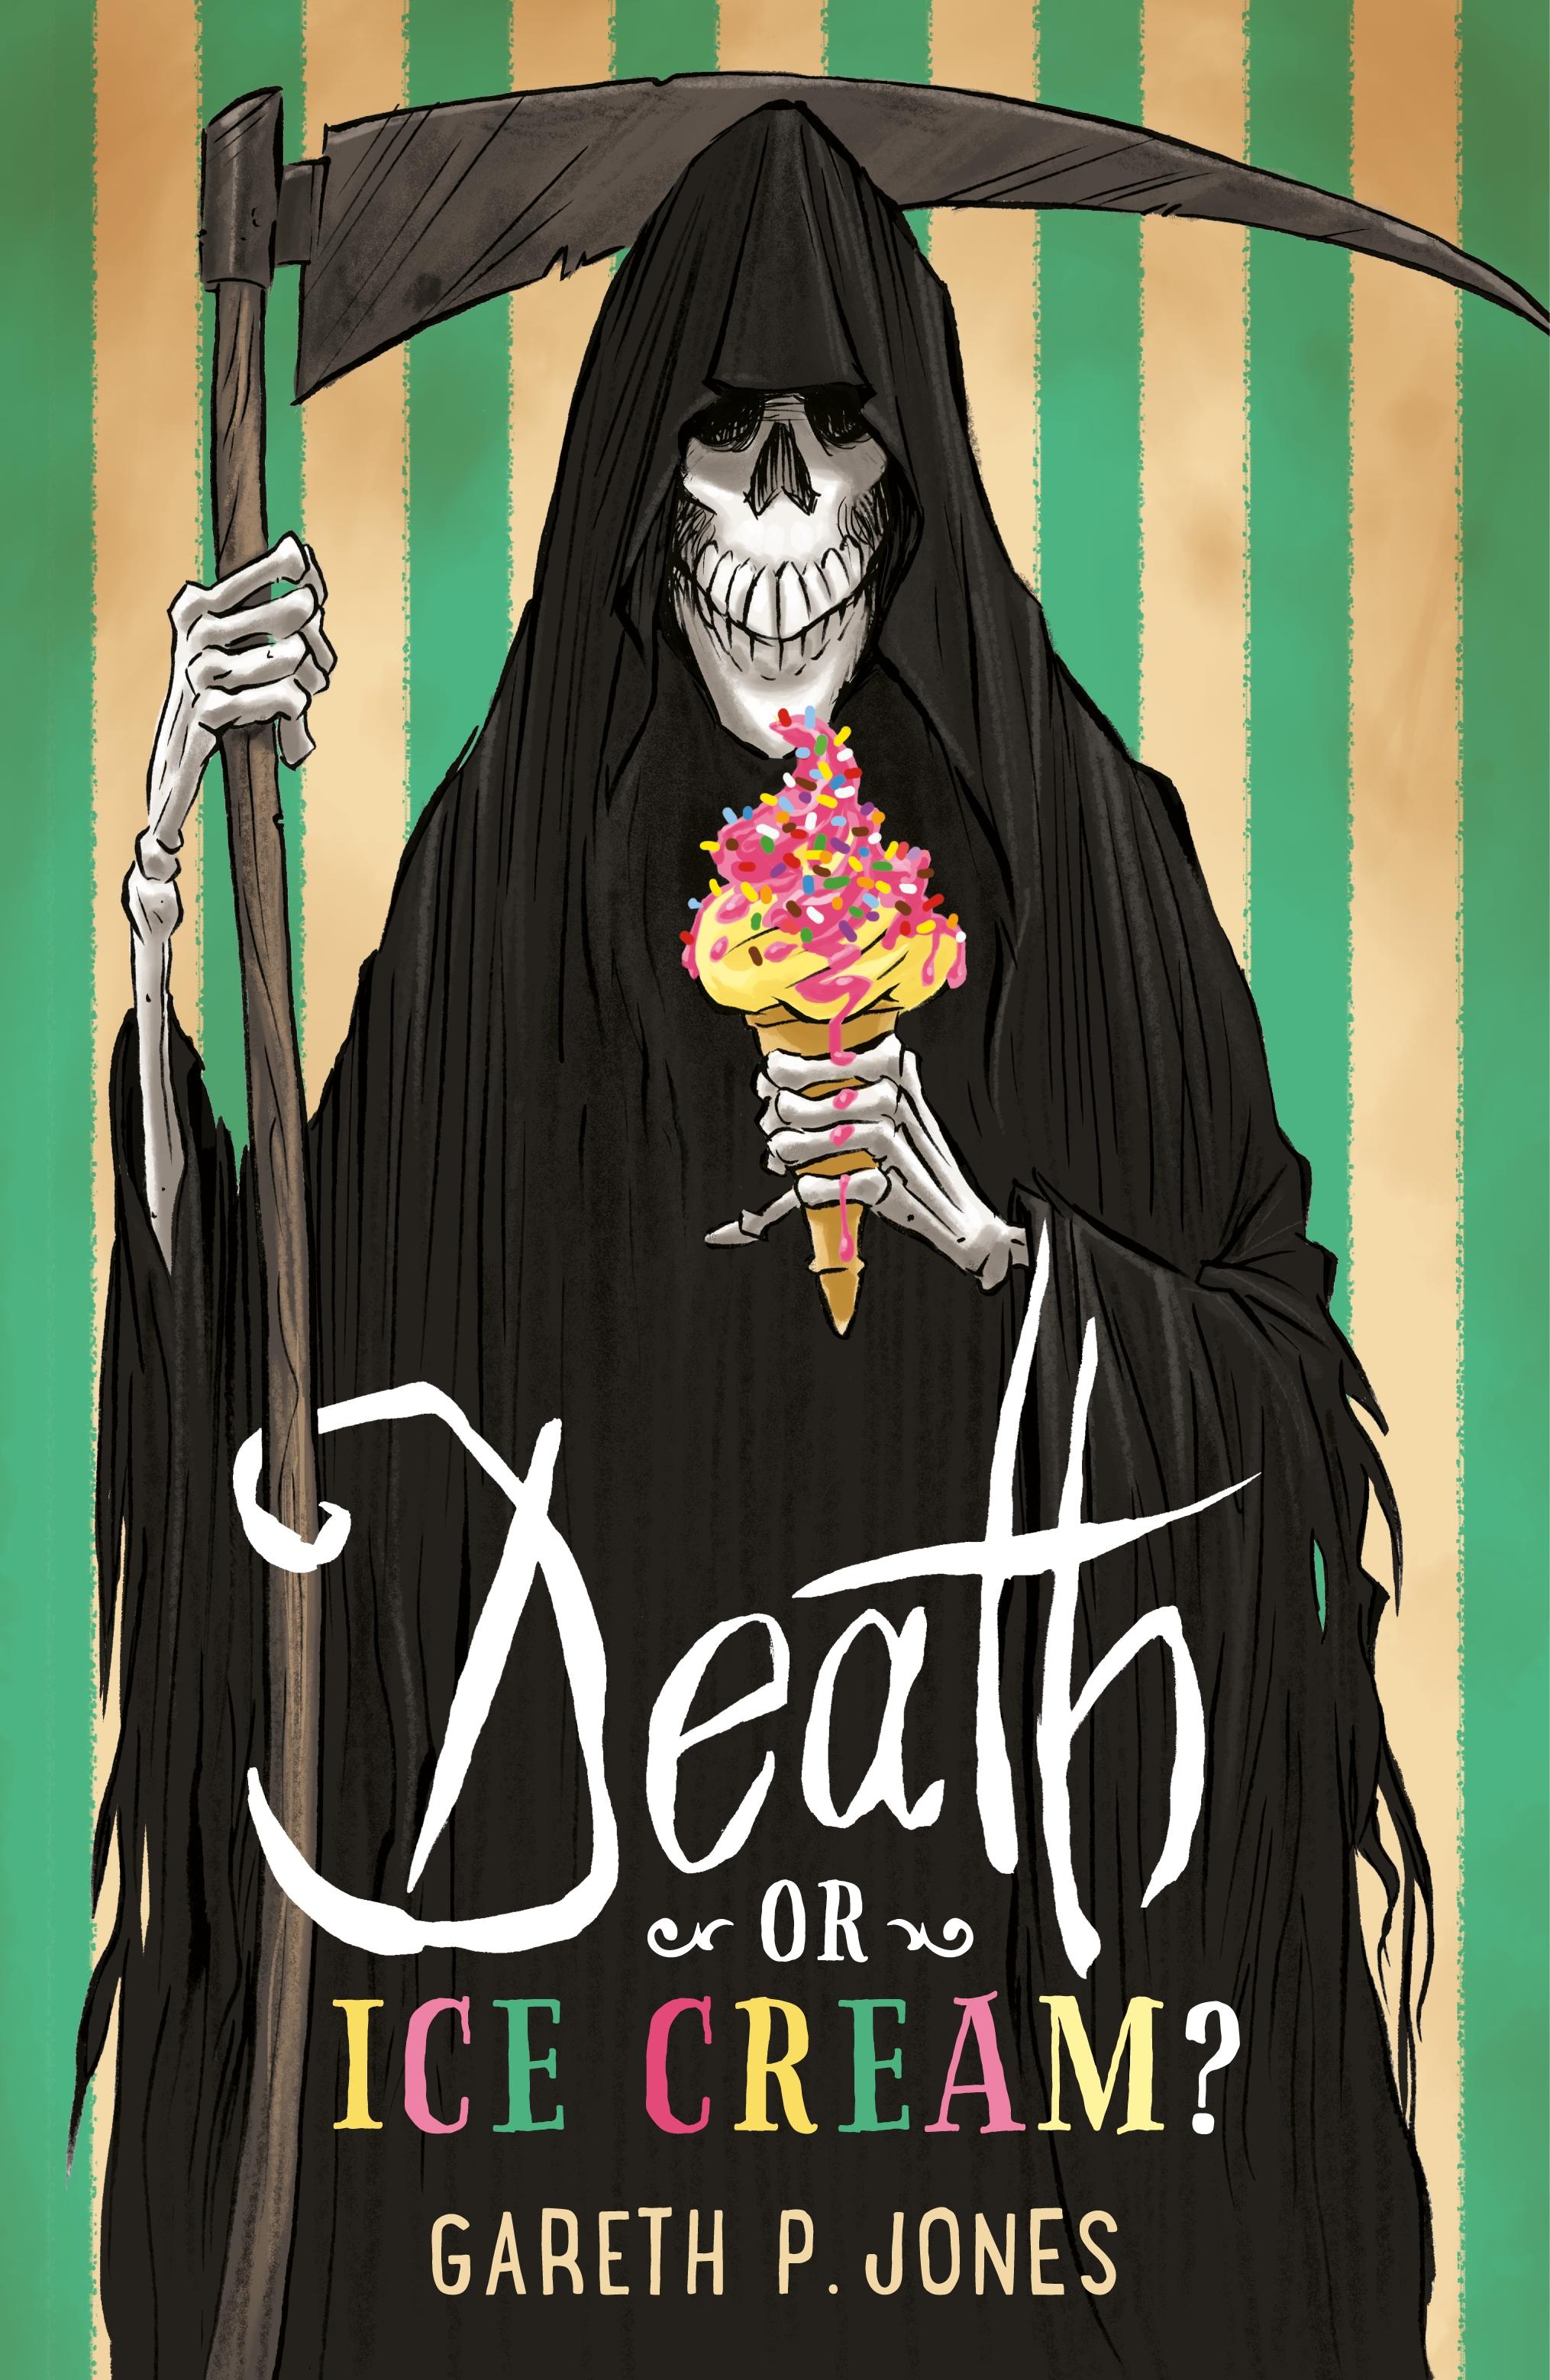 Death or Ice Cream? by Gareth P. Jones